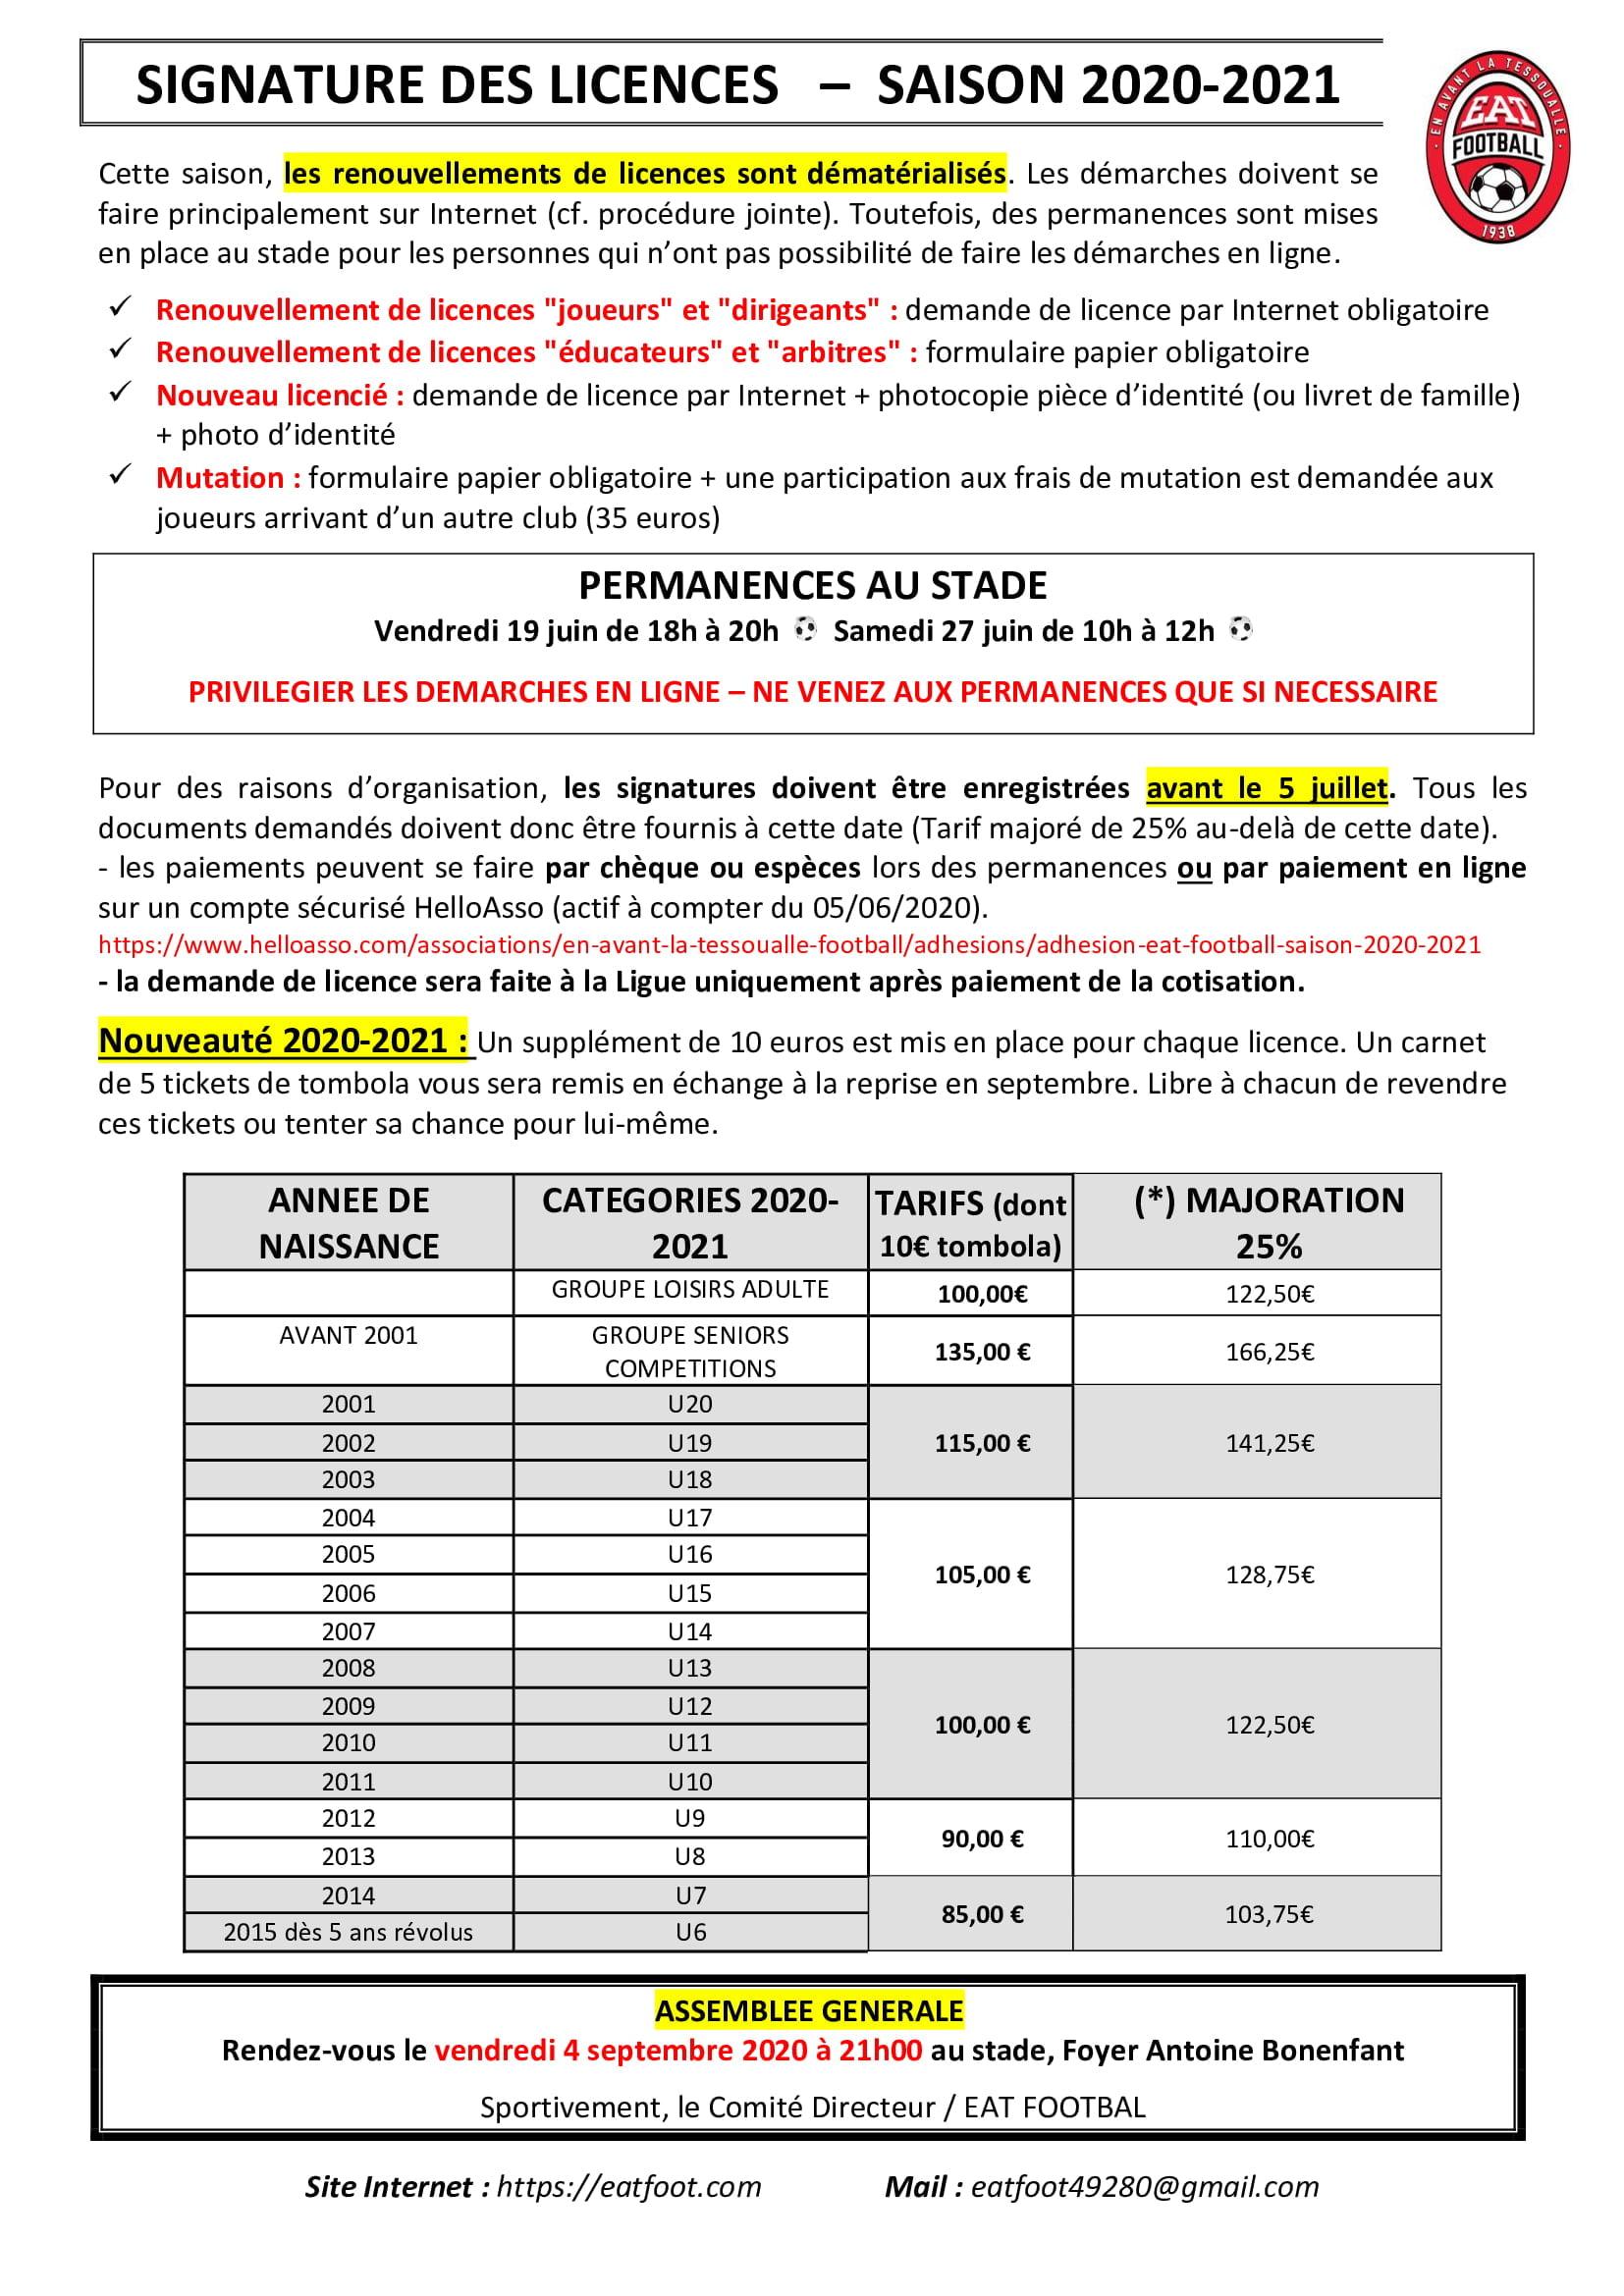 Campagne de licences 2020/2021